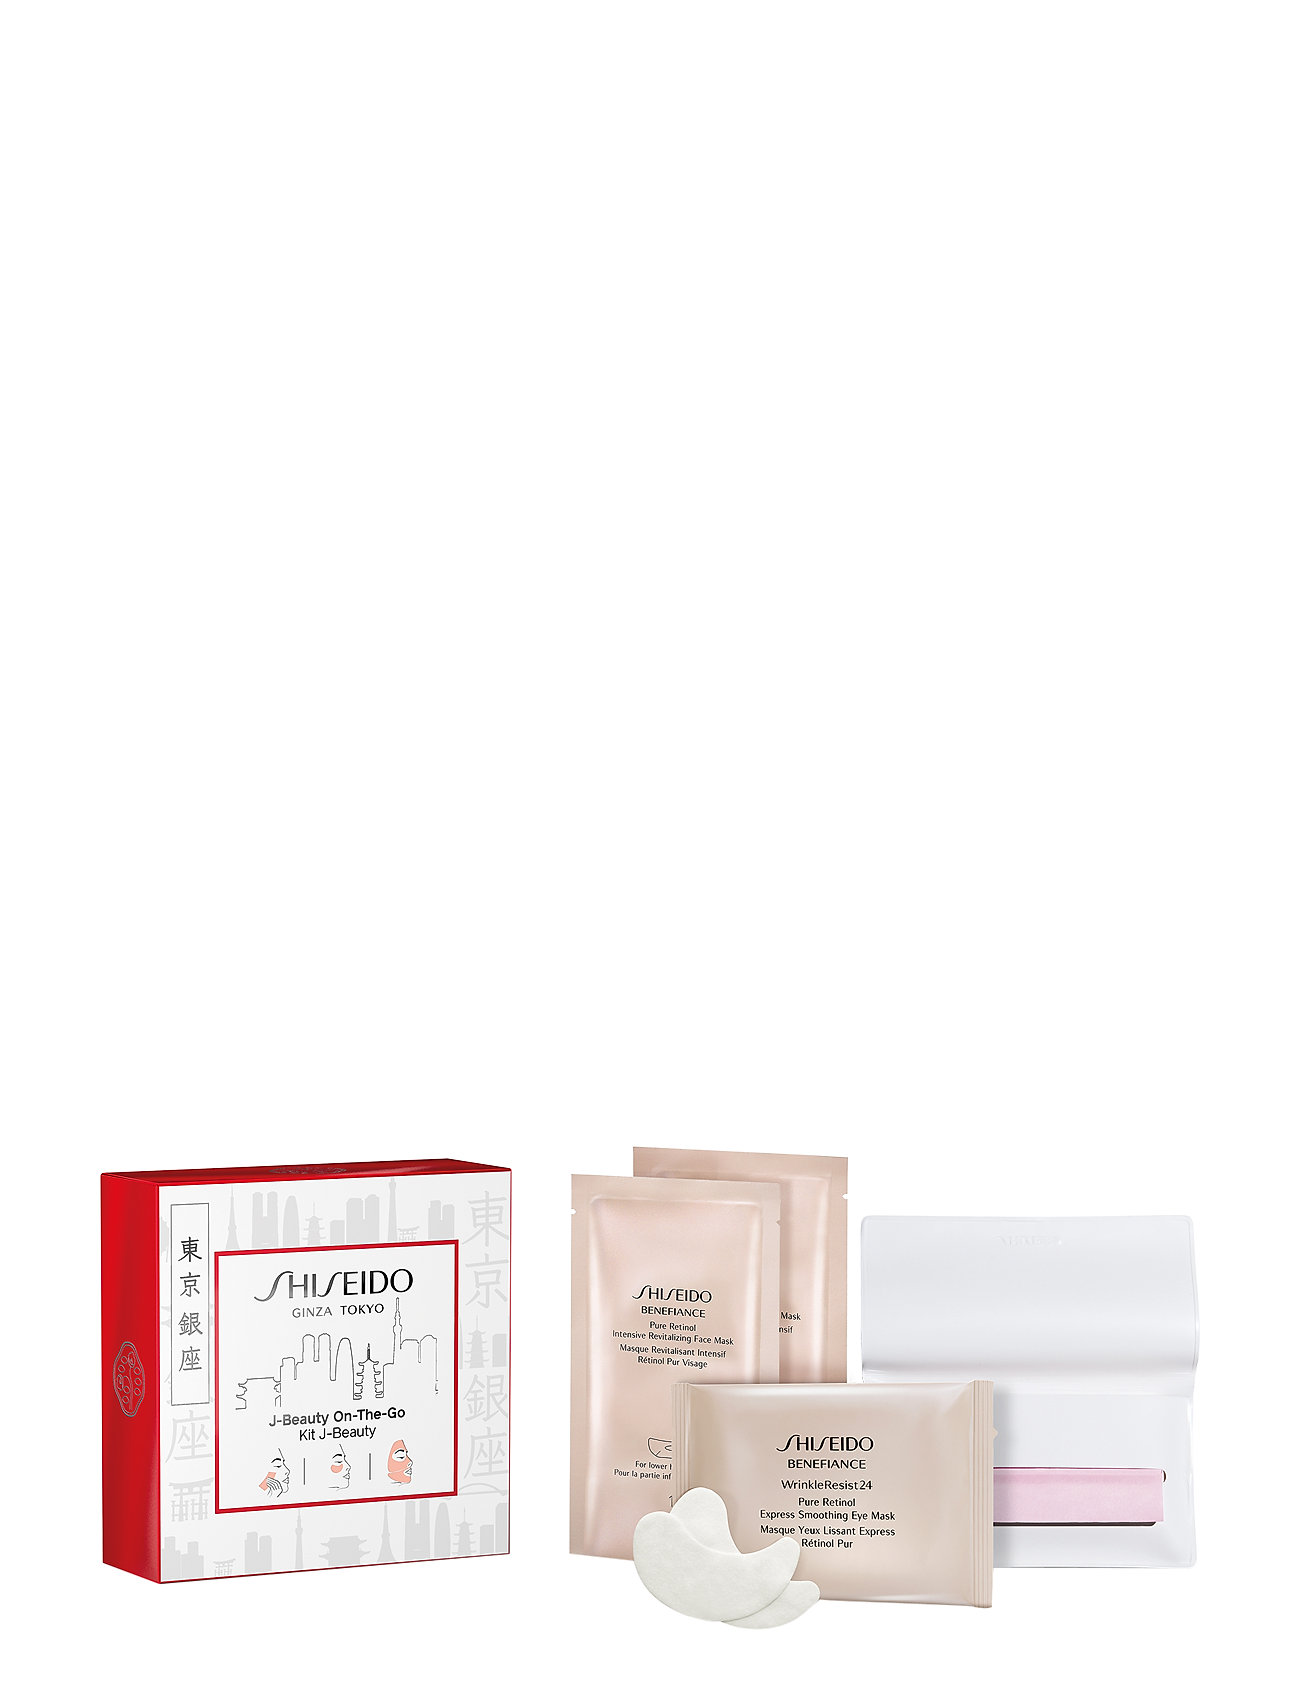 Shiseido GENERIC SKINCARE BLOT P 100/EXPR EY MASK/REV FACE MASK